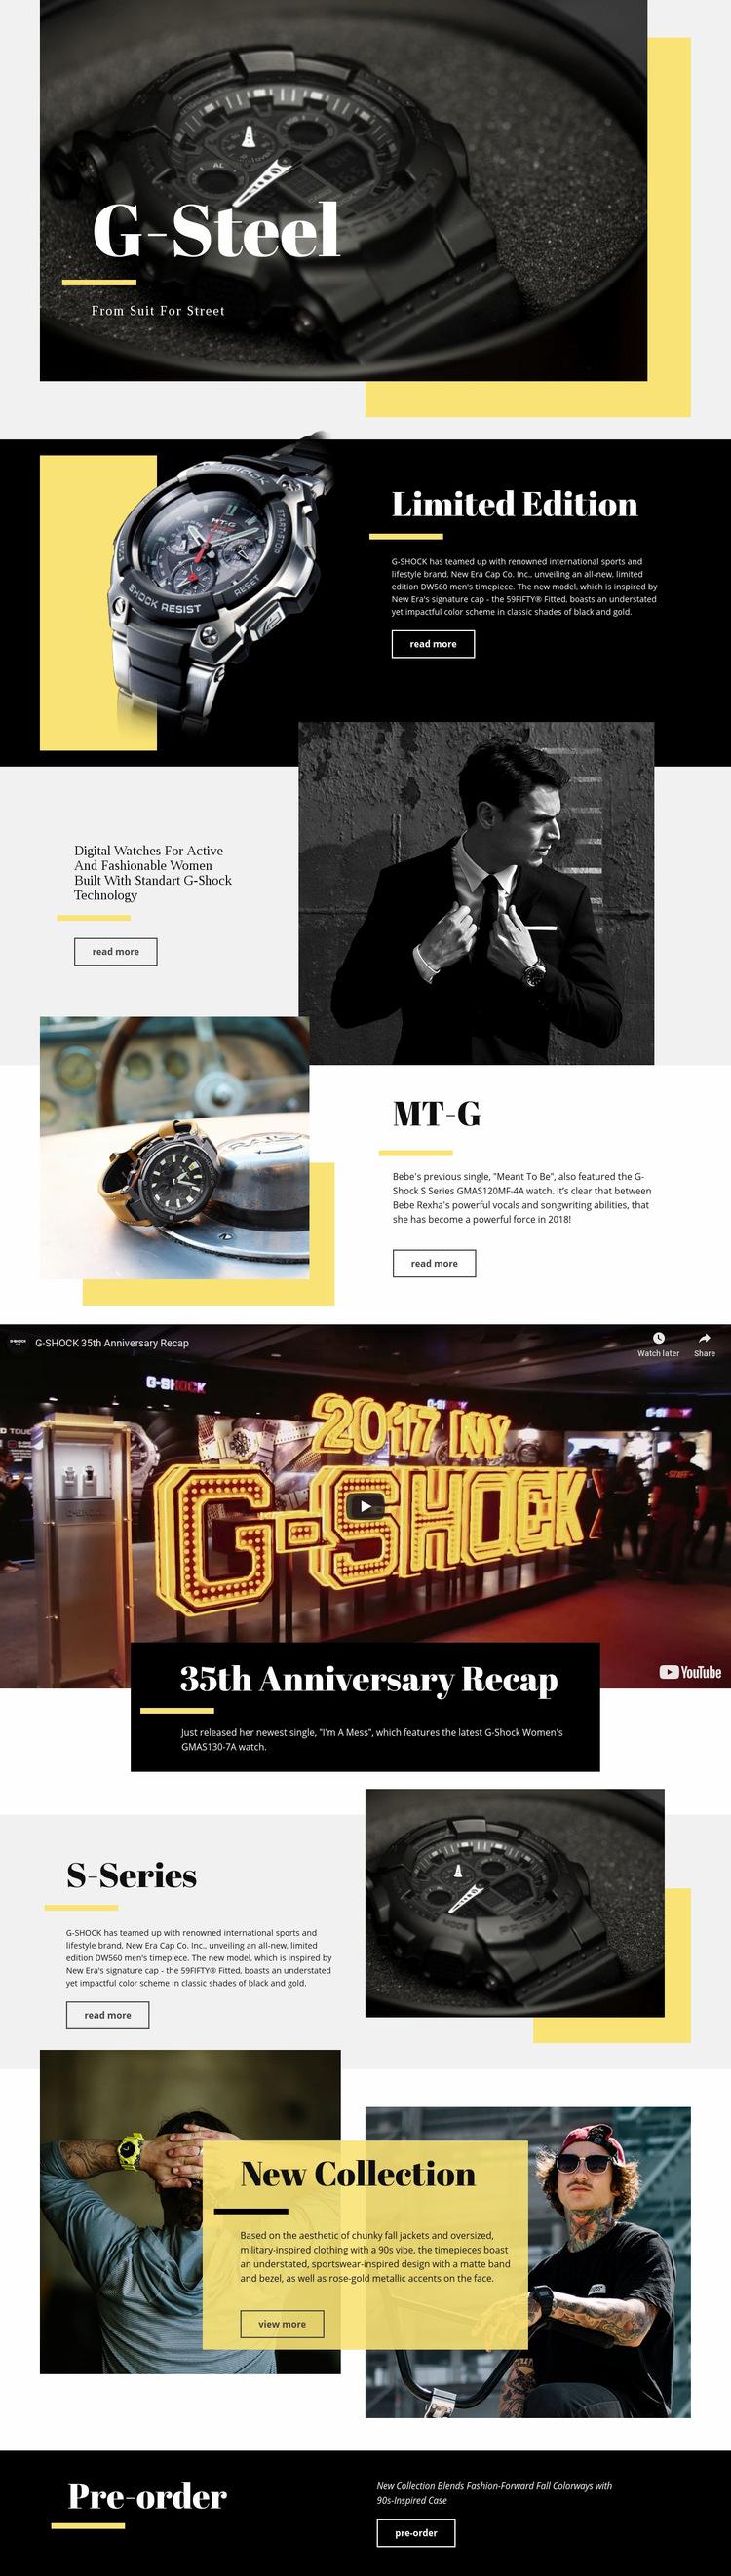 G-Steel Web Page Design